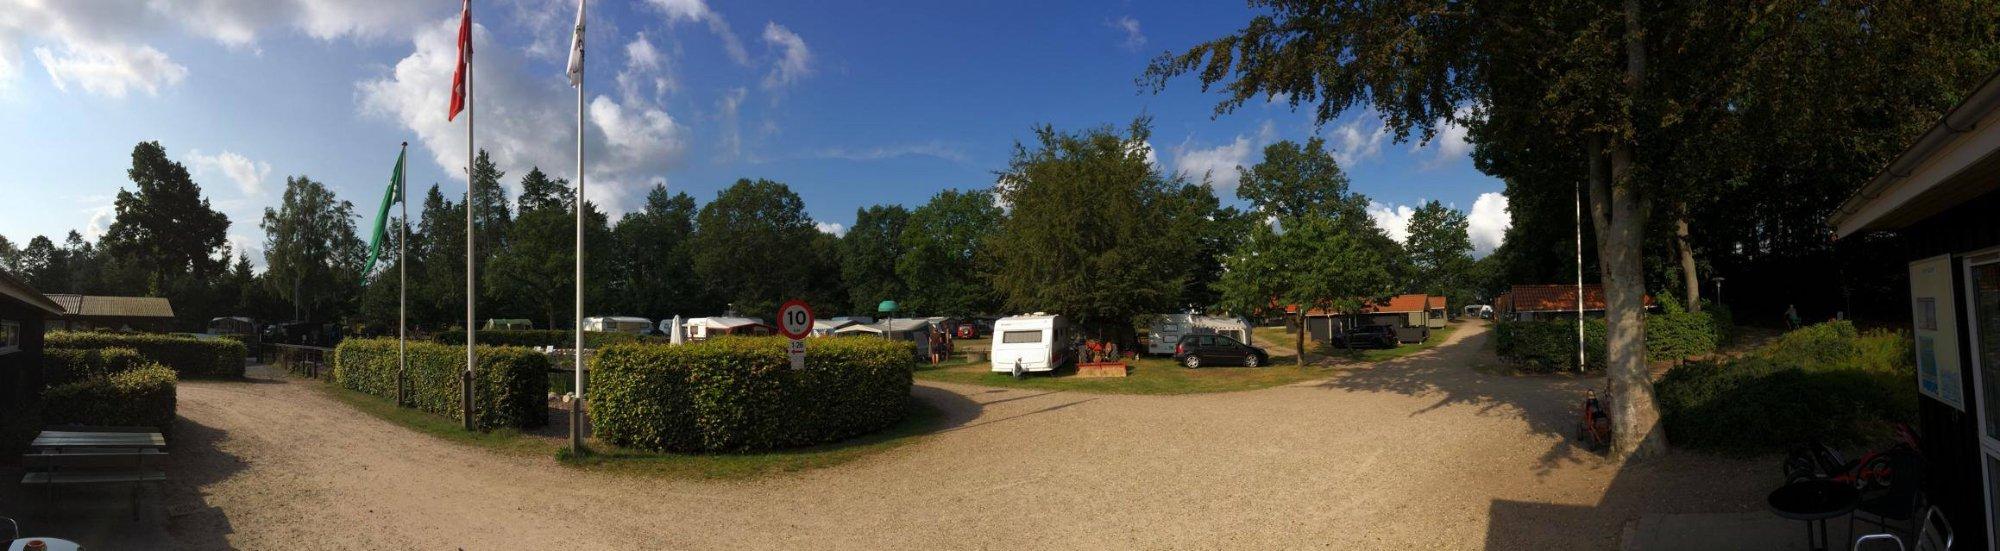 Gudenaaens Camping Silkeborg